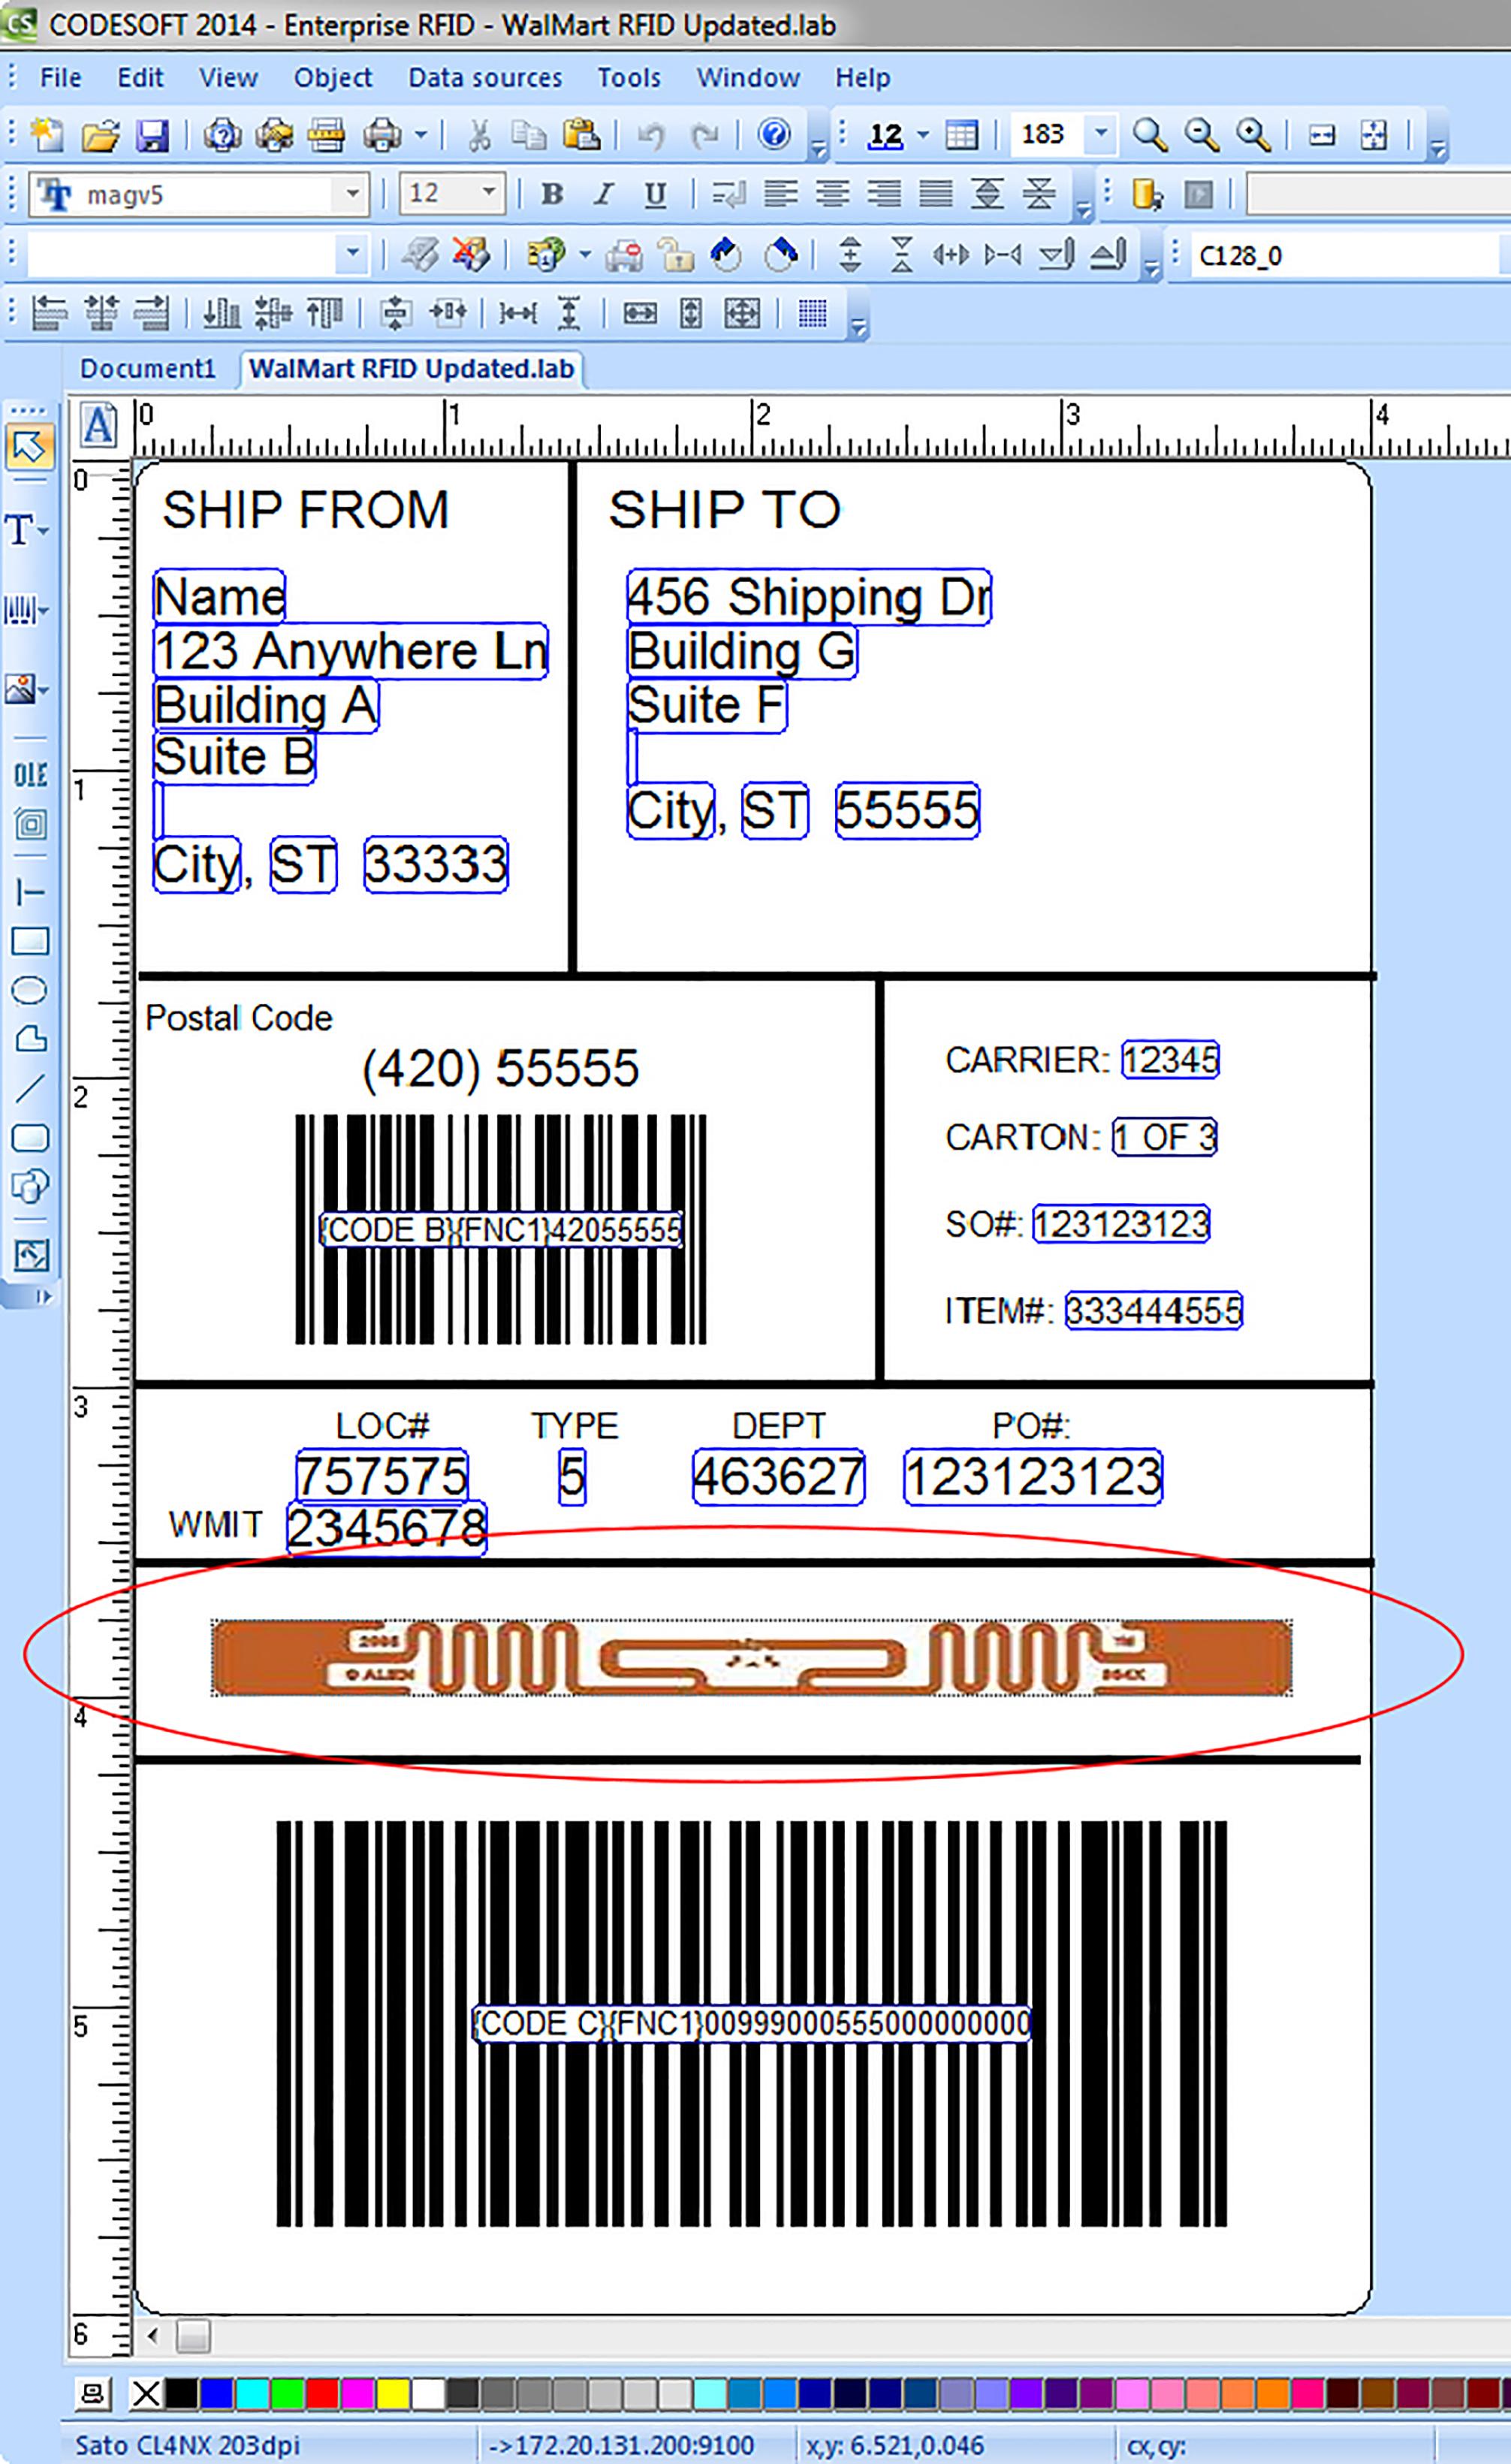 RFID label in CODESOFT Enterprise RFID label software